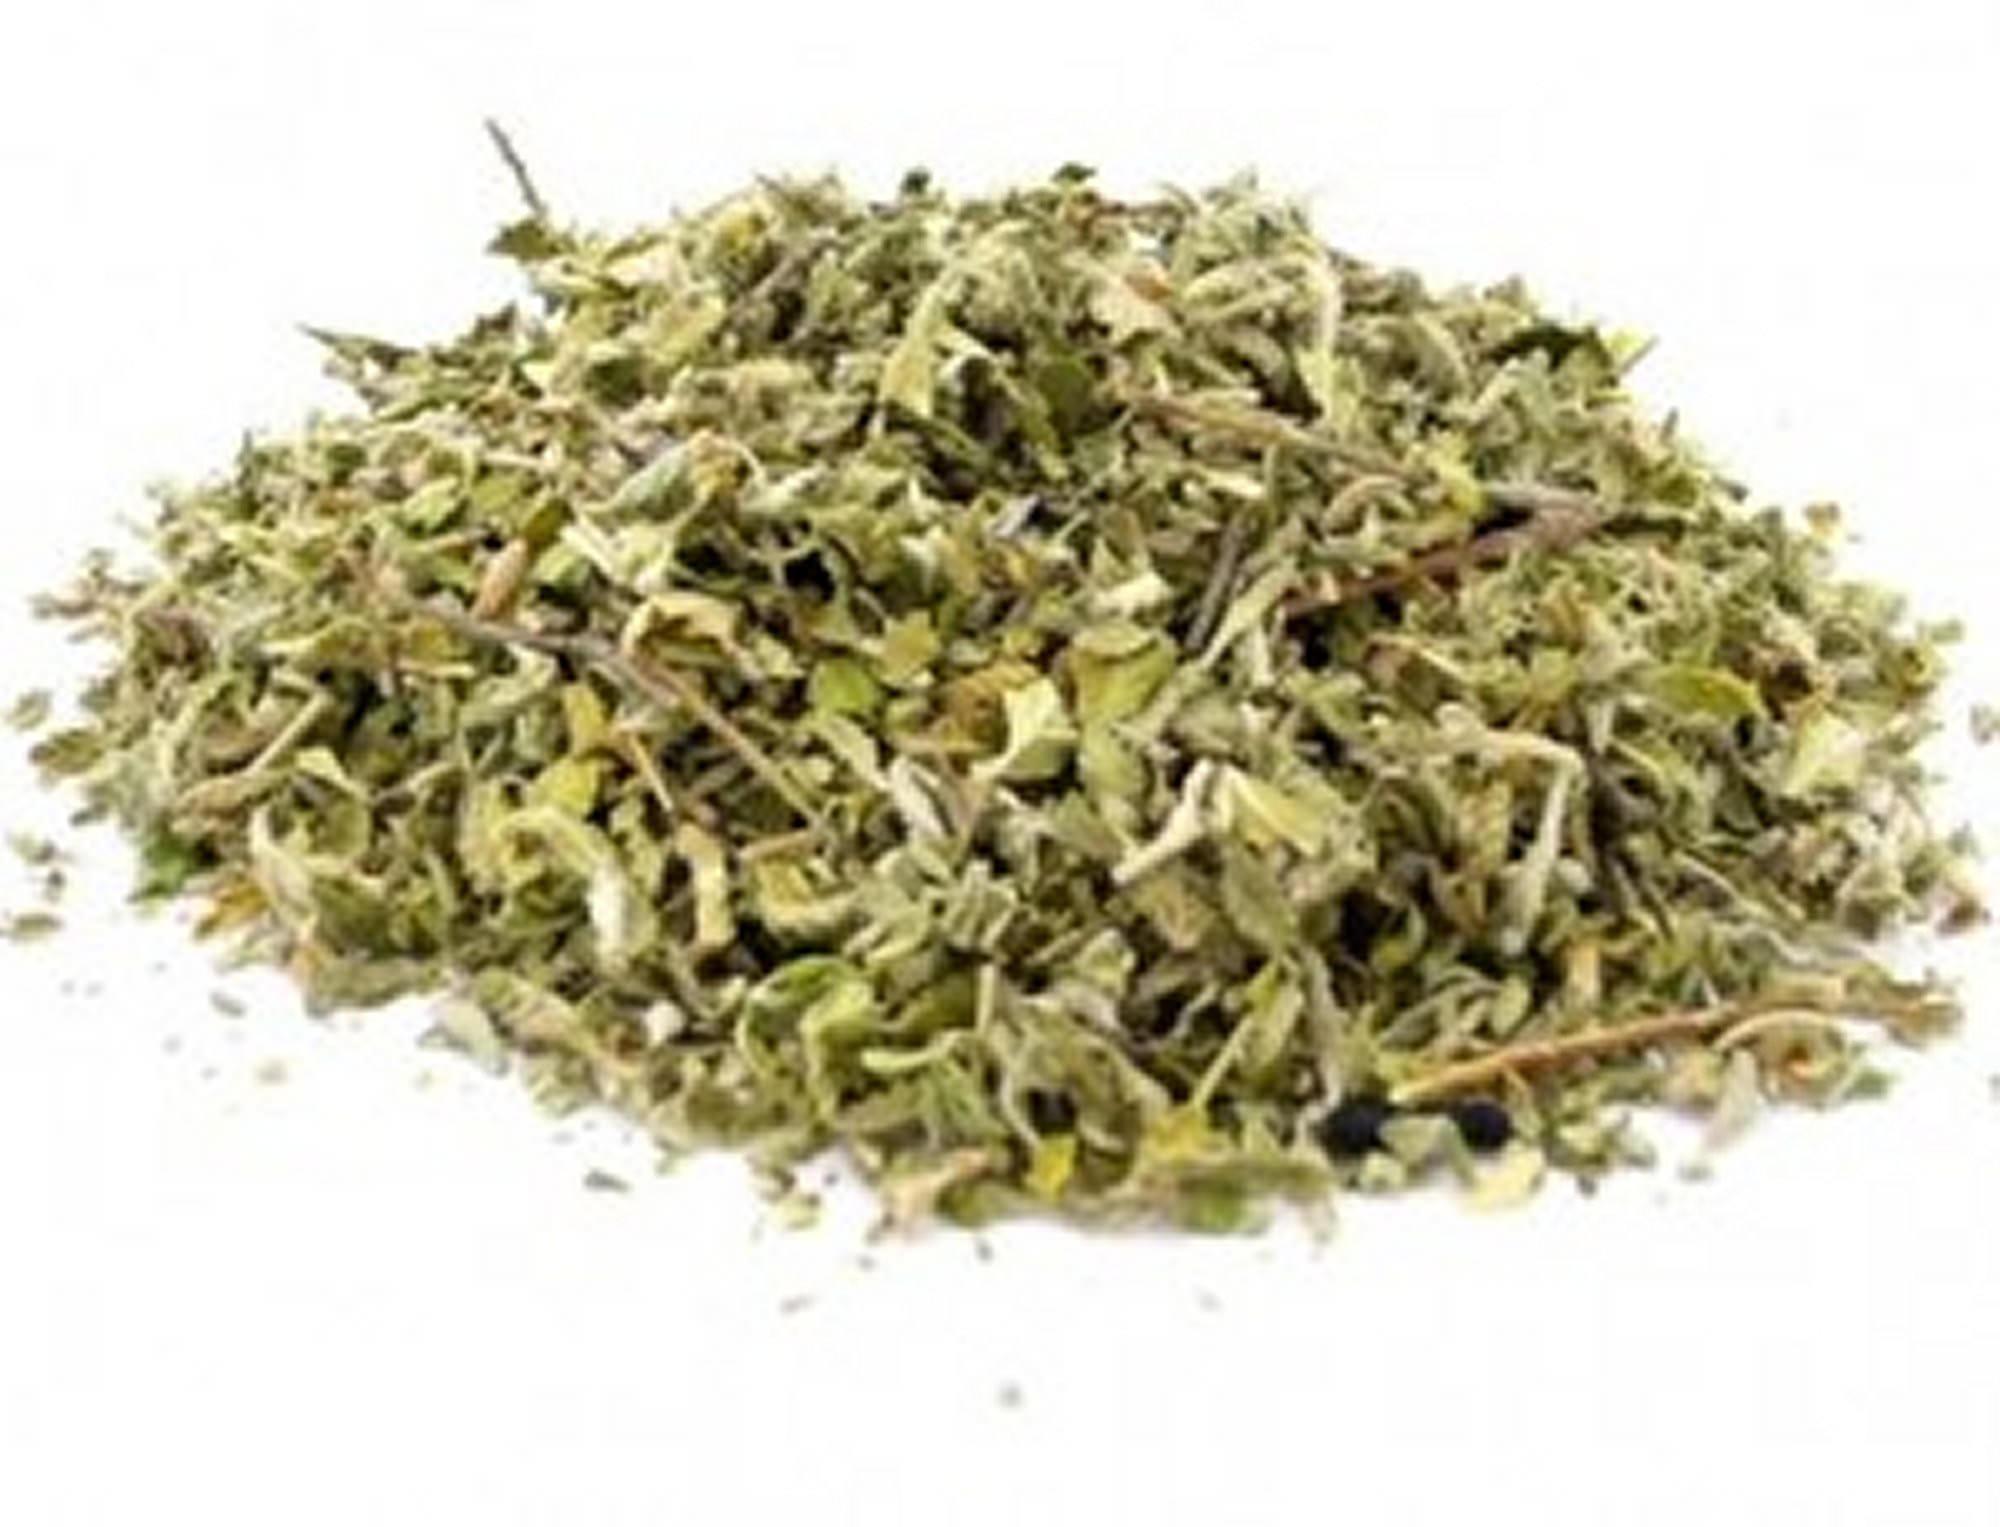 Damiana dried herb leaf